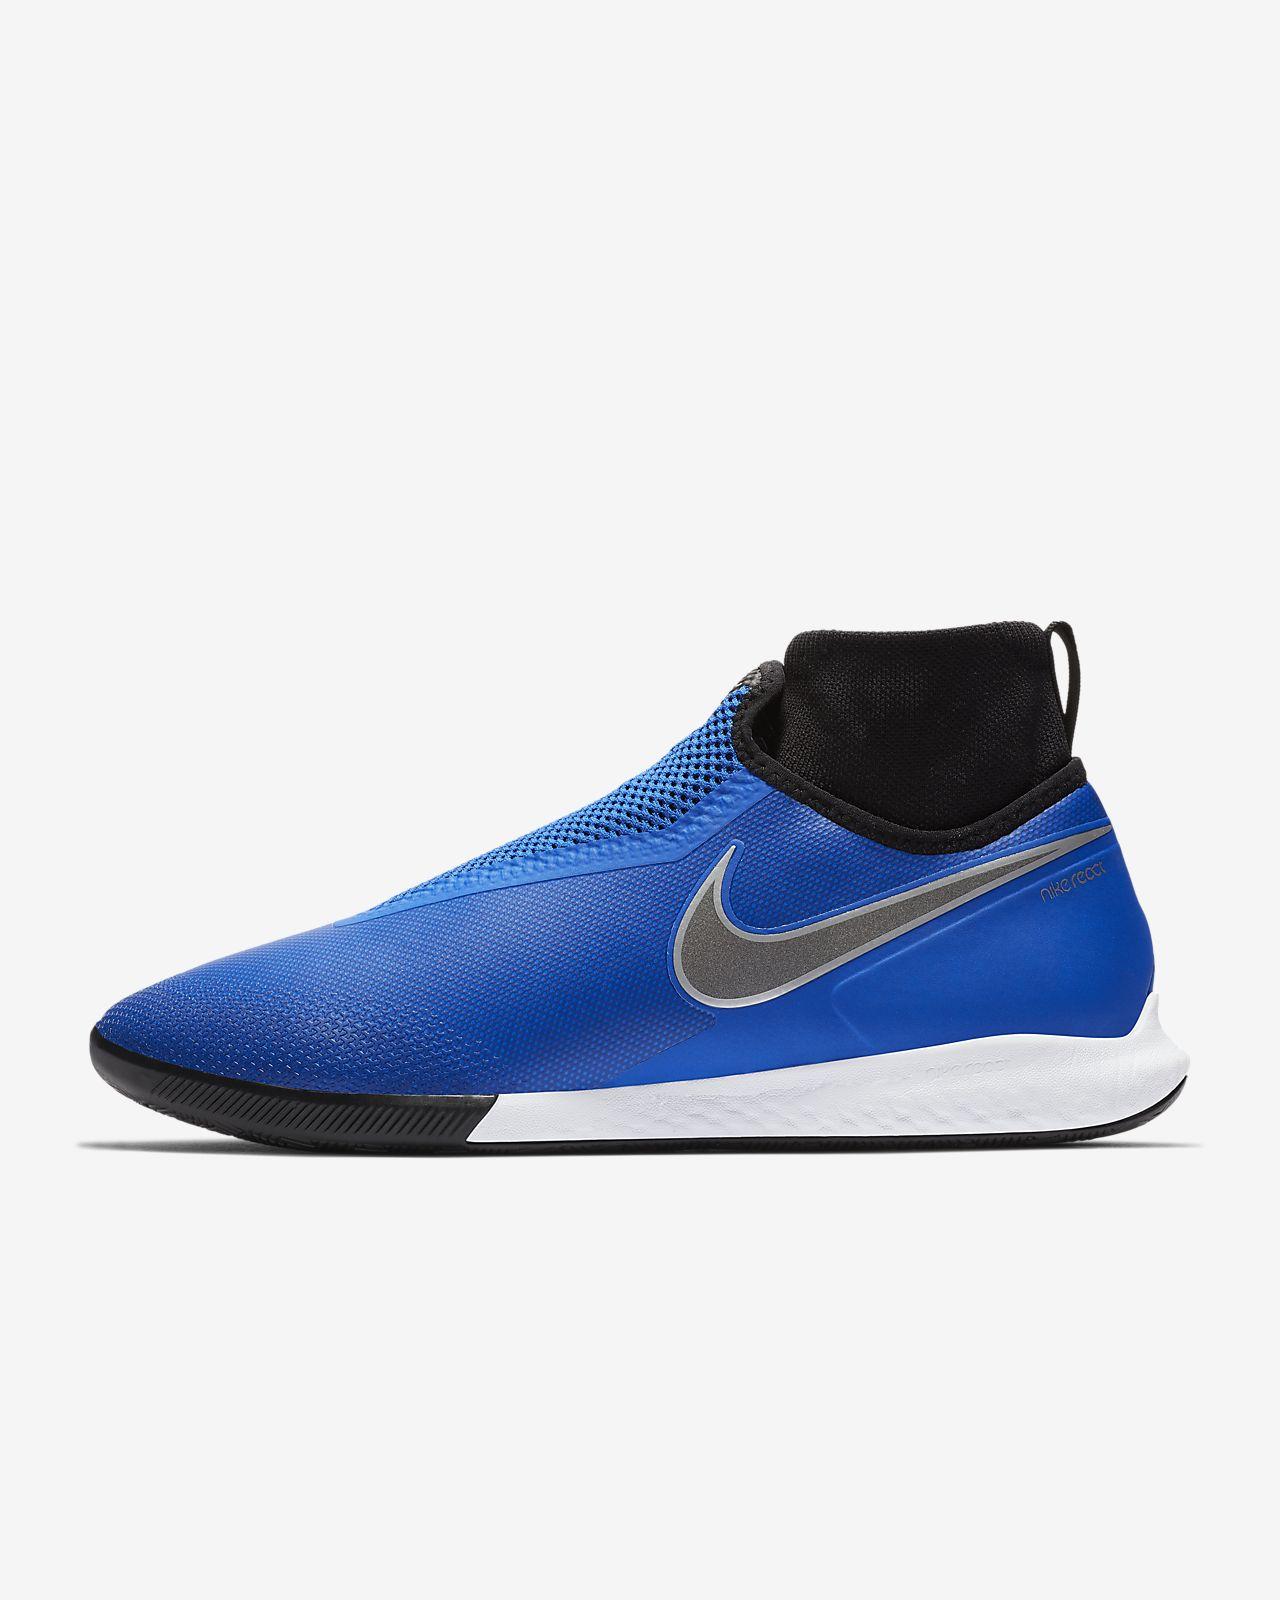 Calzado de fútbol para cancha cubierta Nike React PhantomVSN Pro Dynamic Fit IC